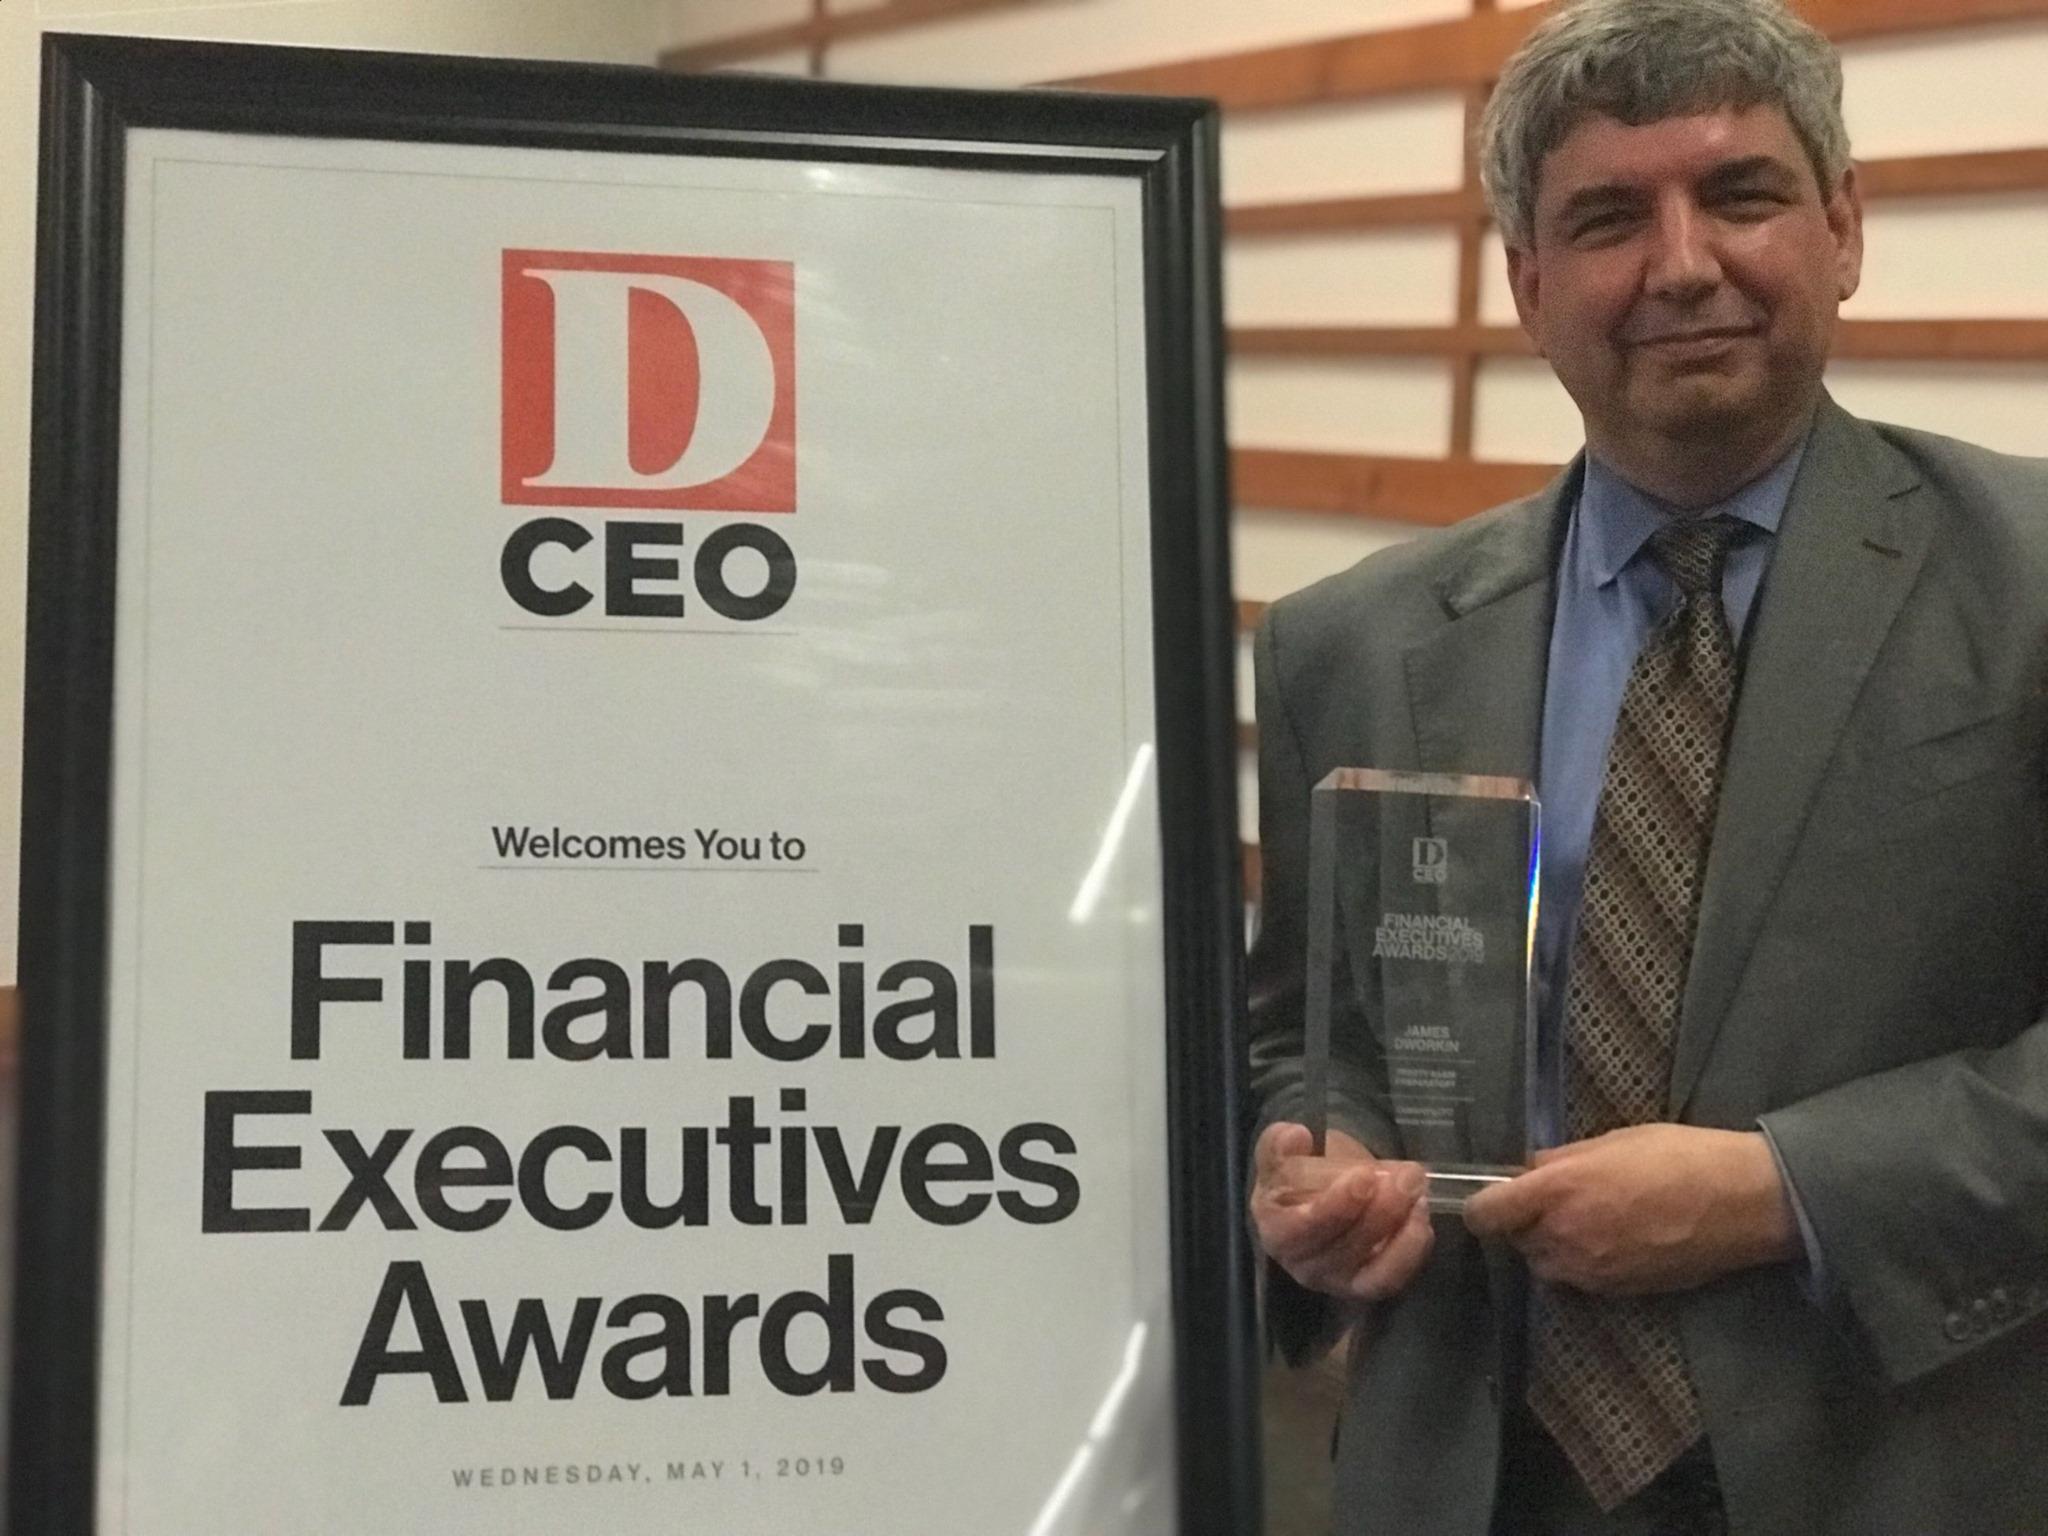 D CEO 2019 Financial Executives Award Ceremony